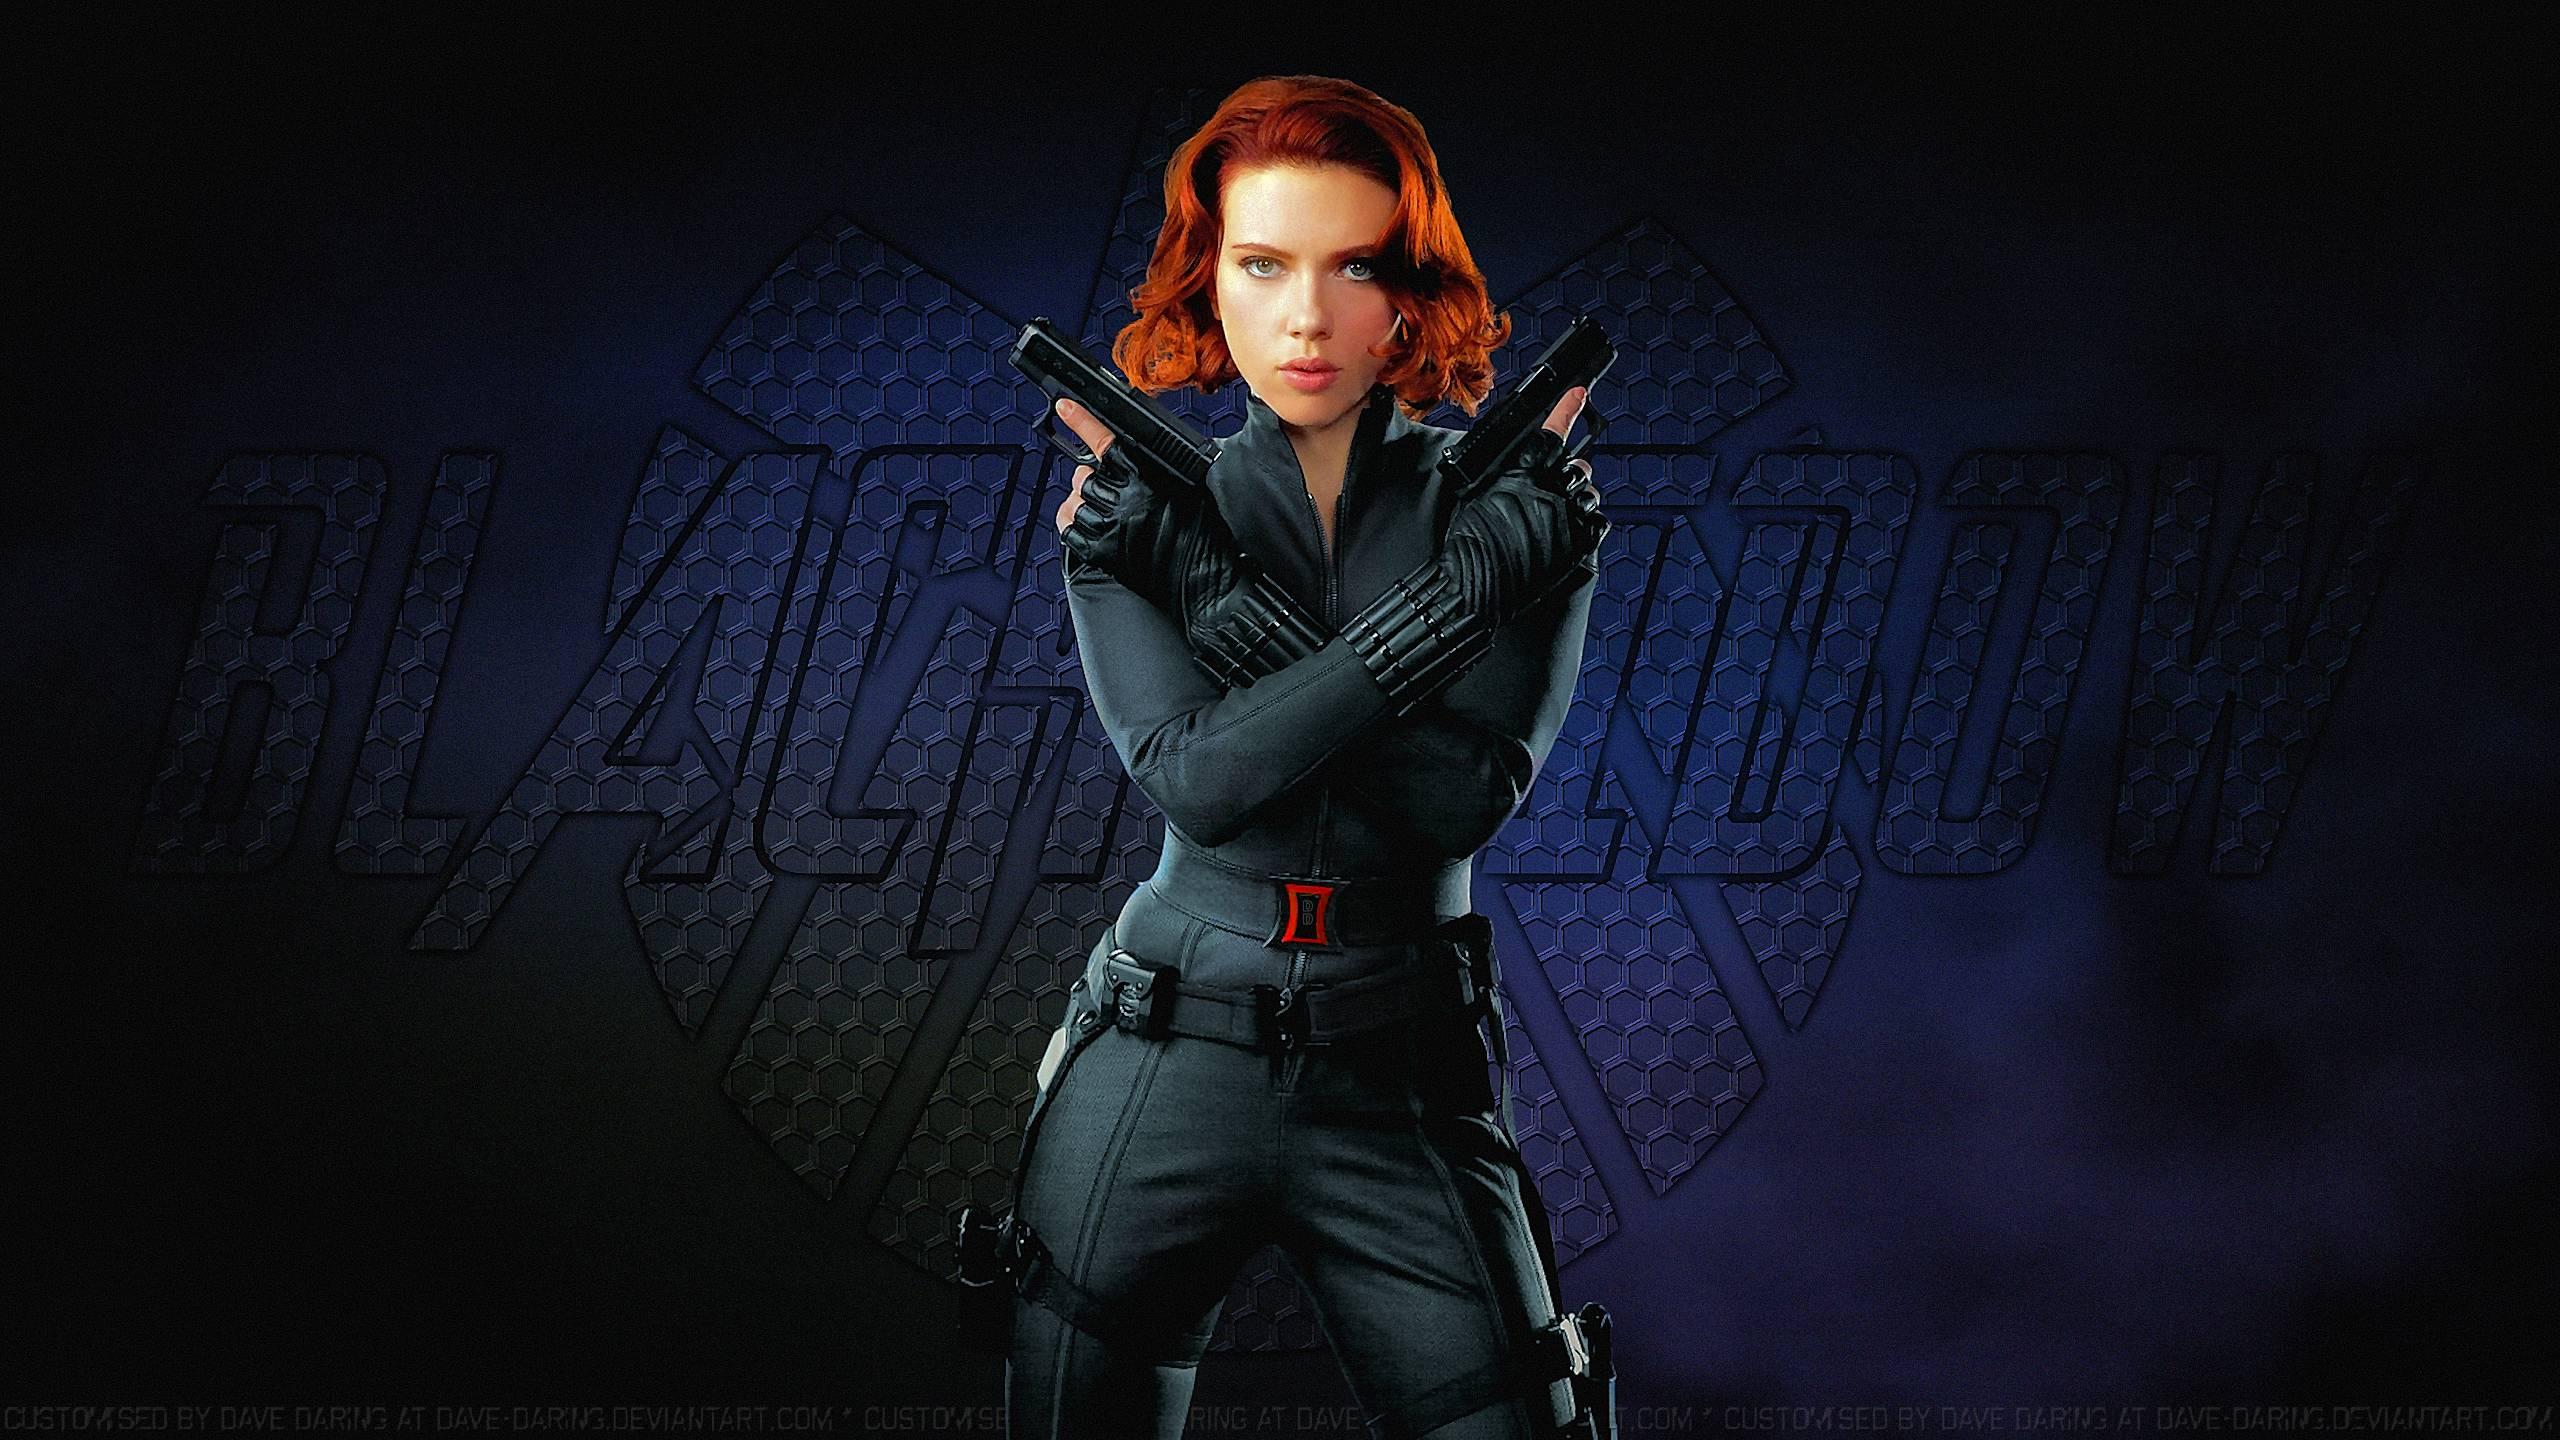 Scarlett Johansson Black Widow XXIII by Dave-Daring